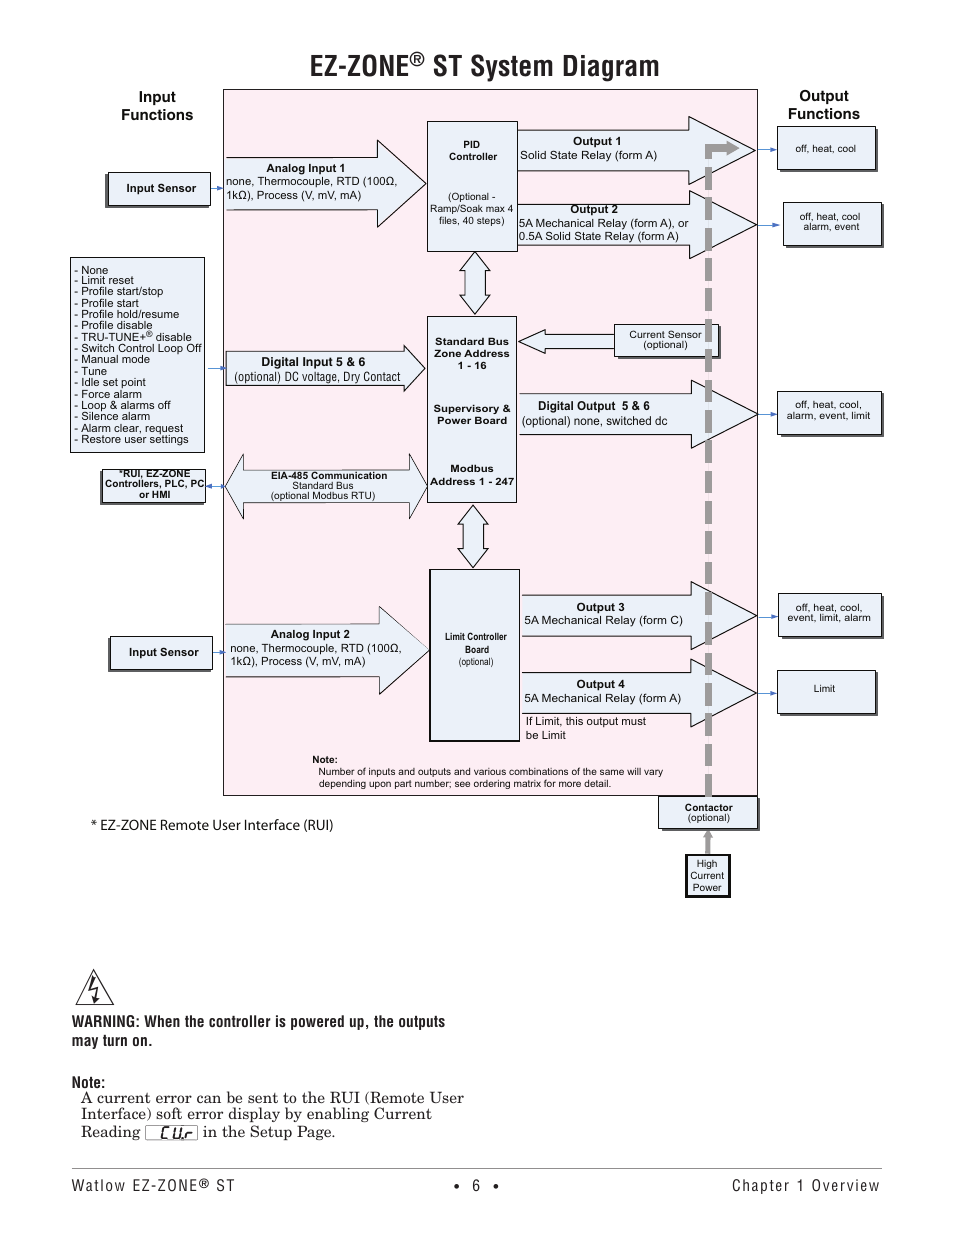 Watlow Heater Wiring Diagram Electrical Schematic